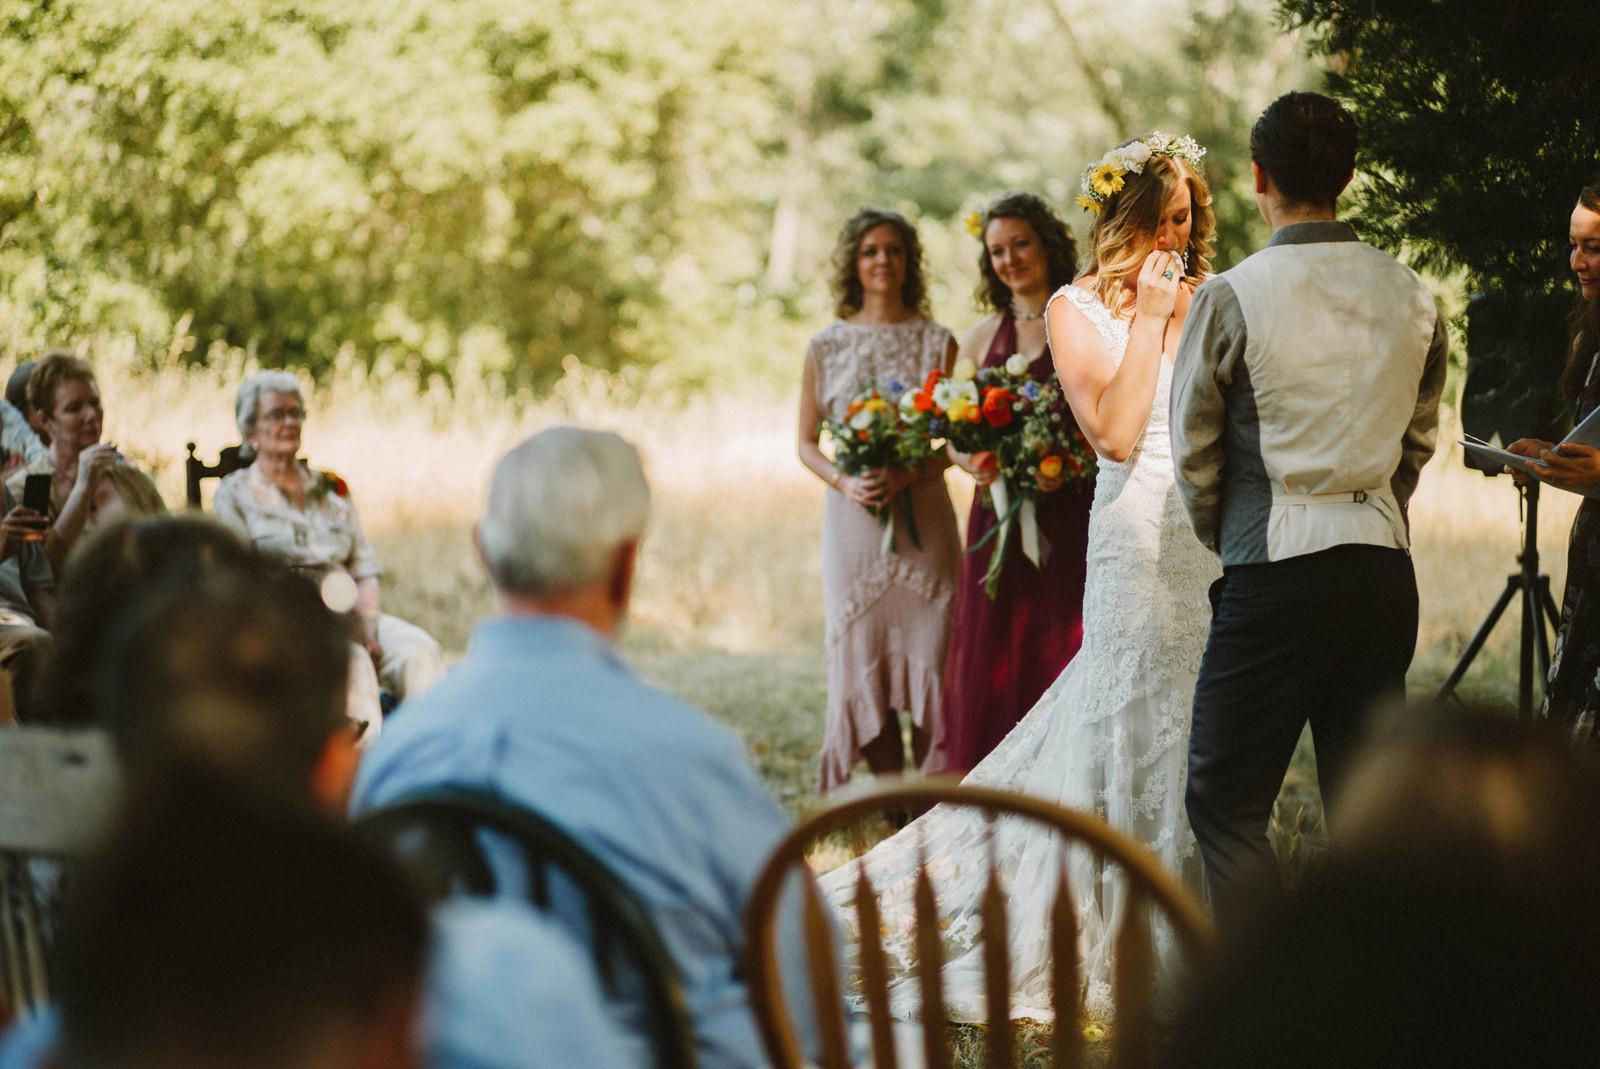 rivers-bend-retreat-wedding-029 RIVER'S BEND RETREAT WEDDING